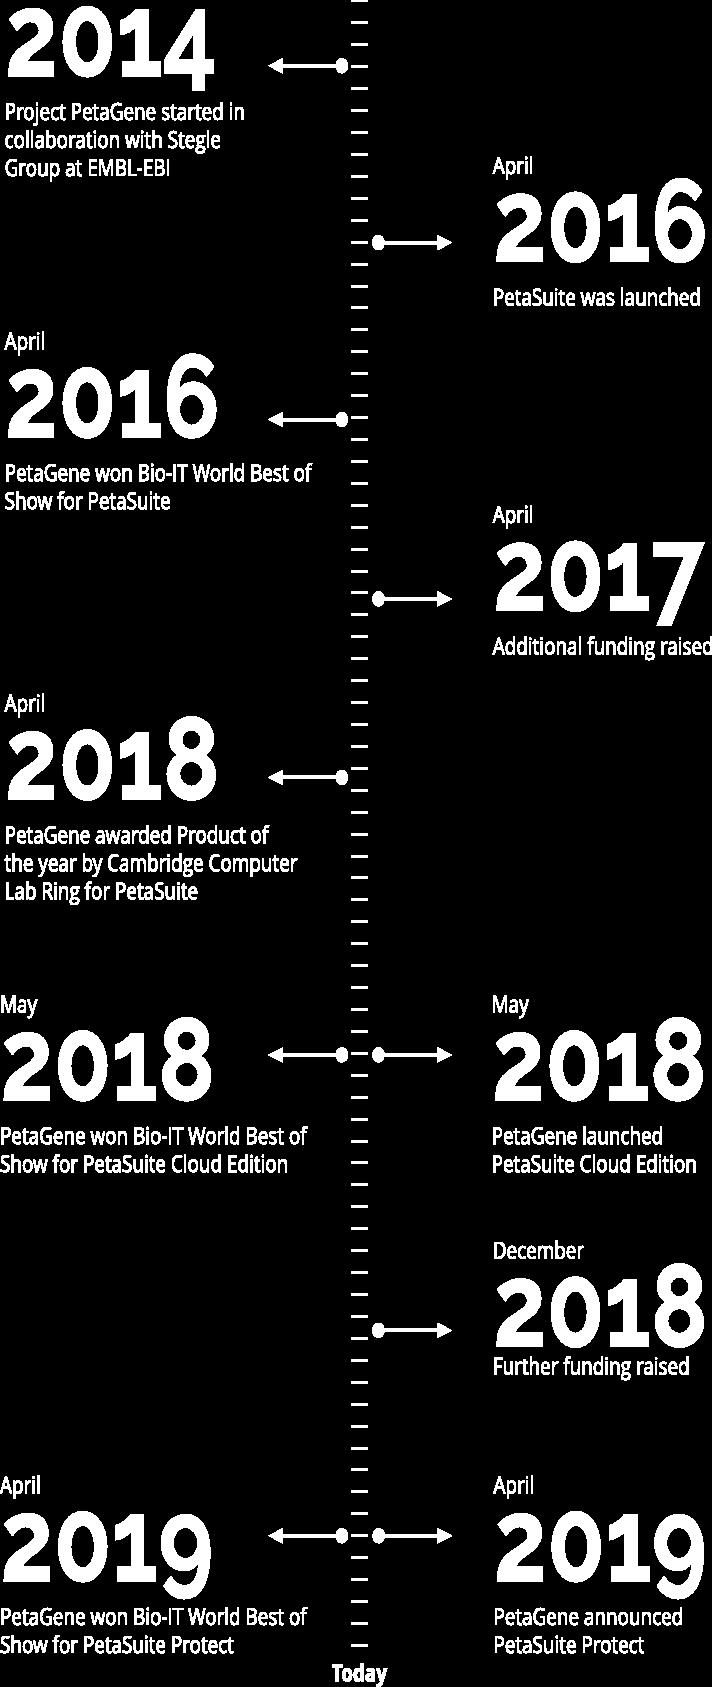 PetaGene history timeline